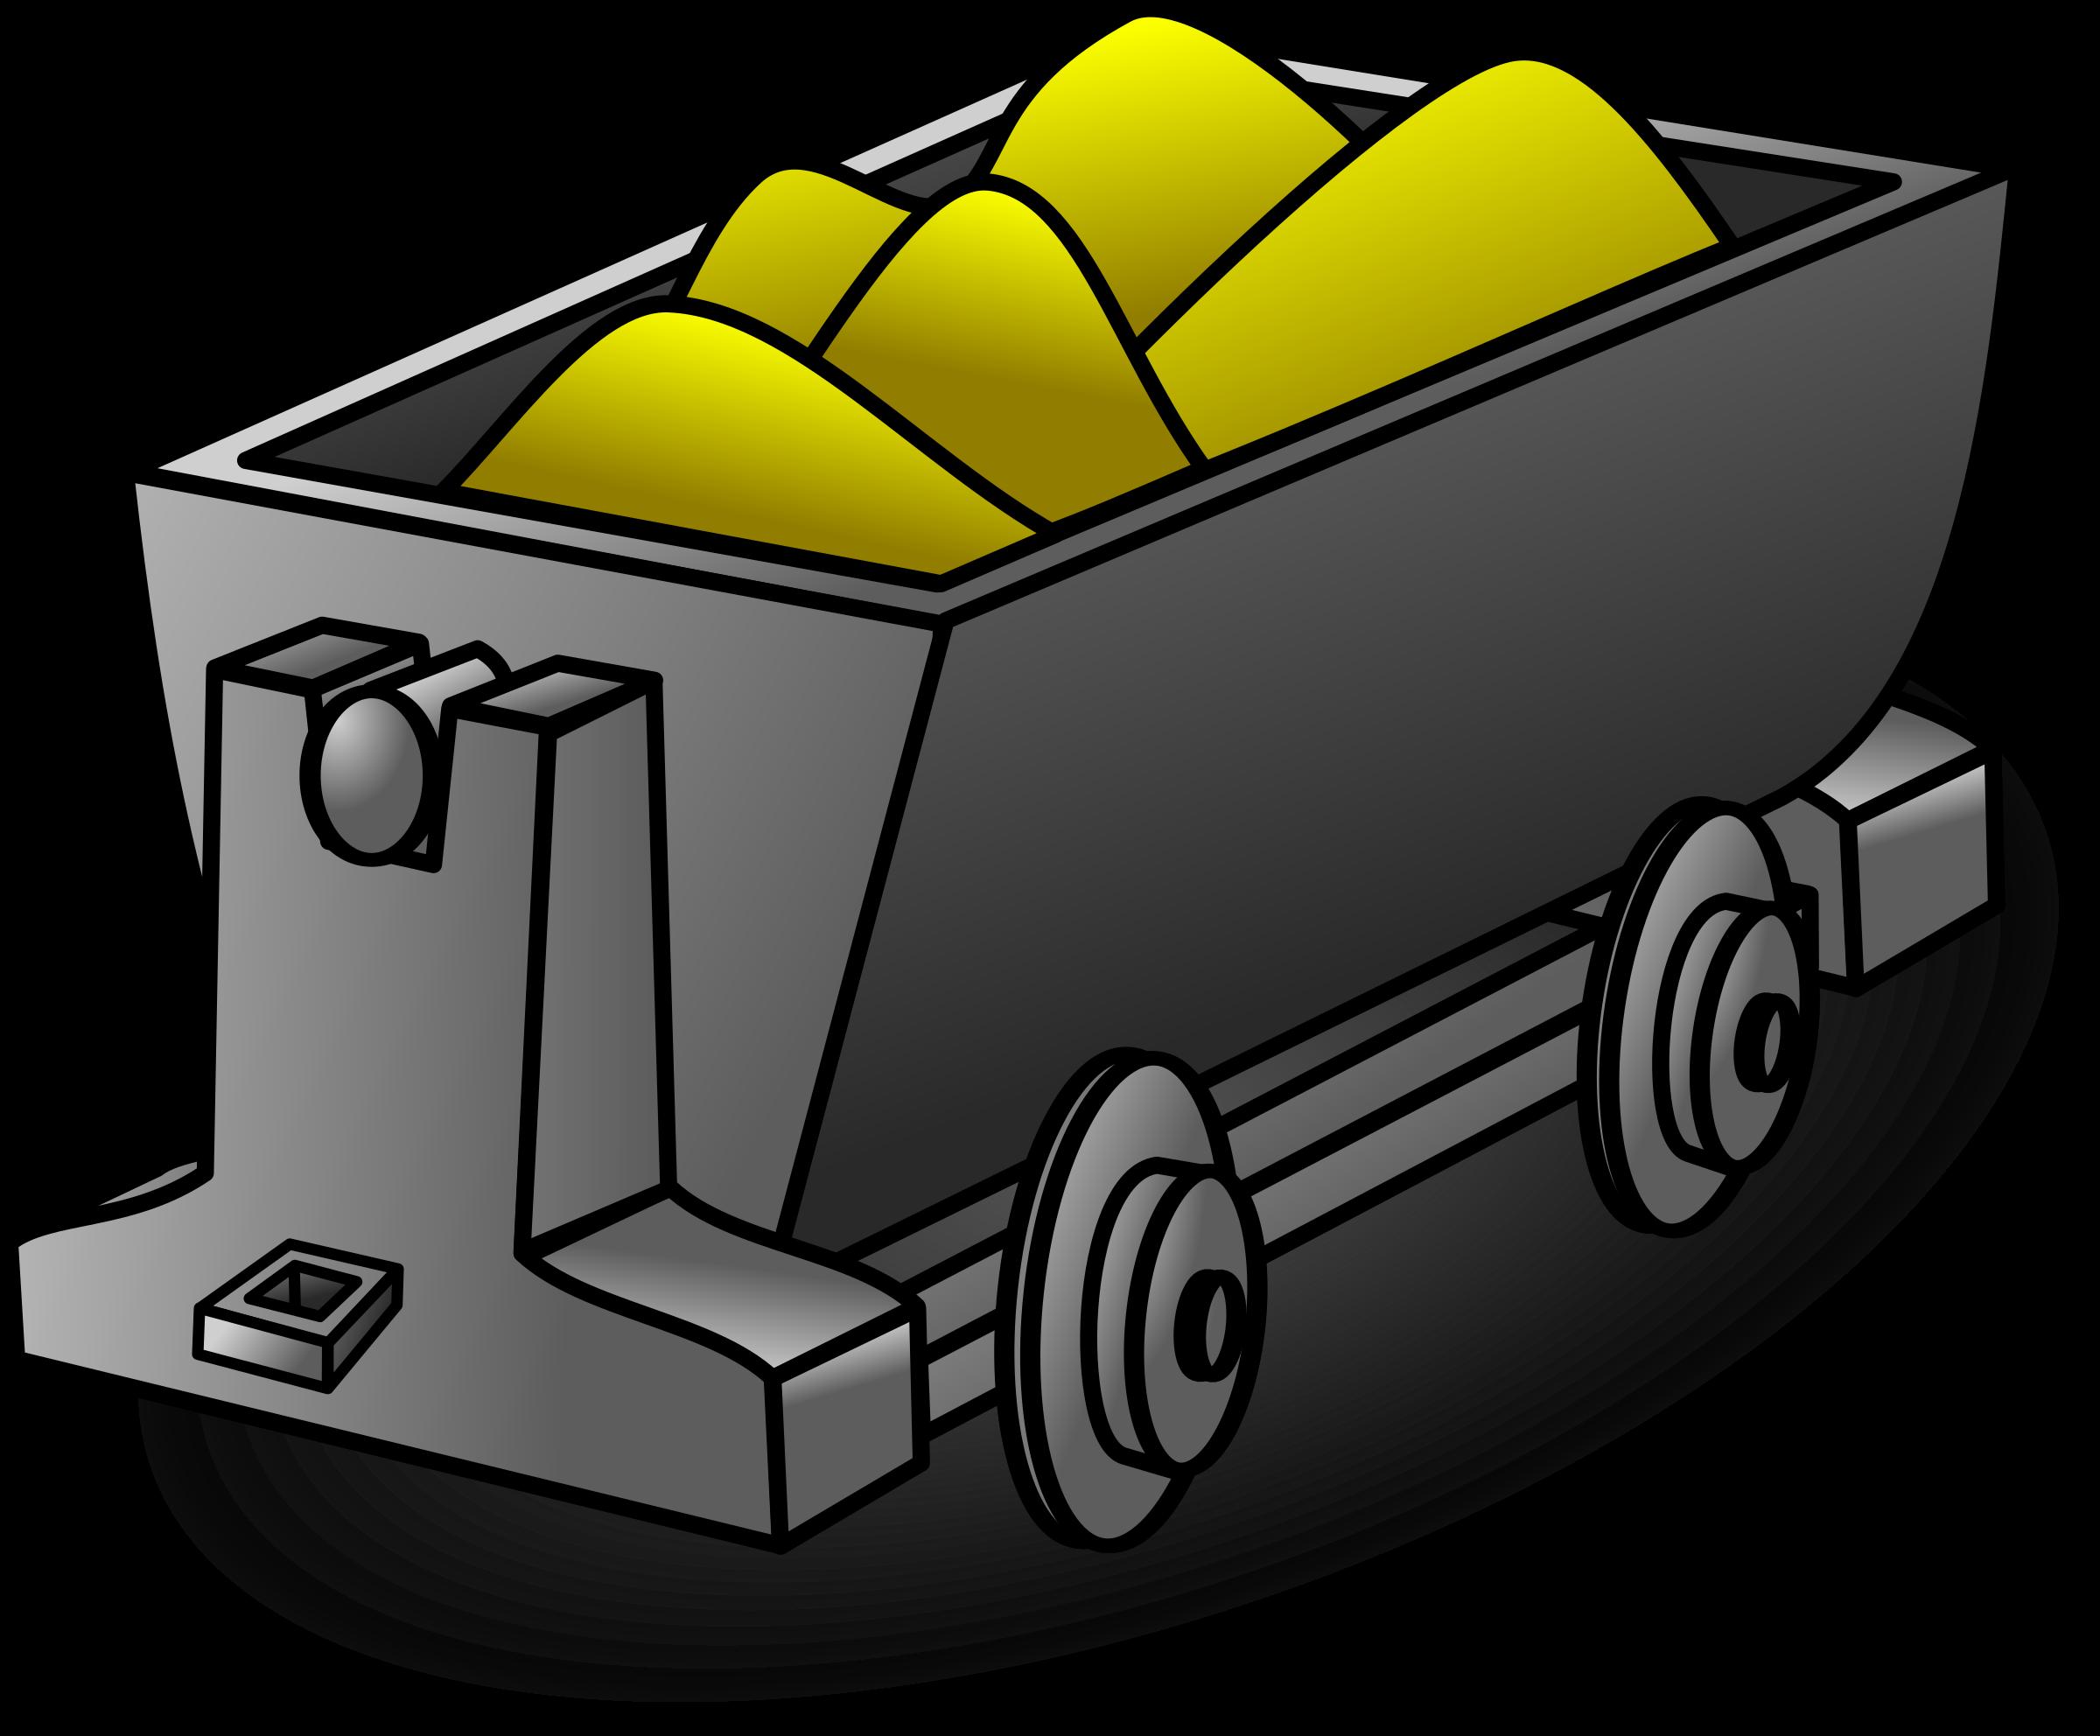 Mining clipart minecart, Mining minecart Transparent FREE.